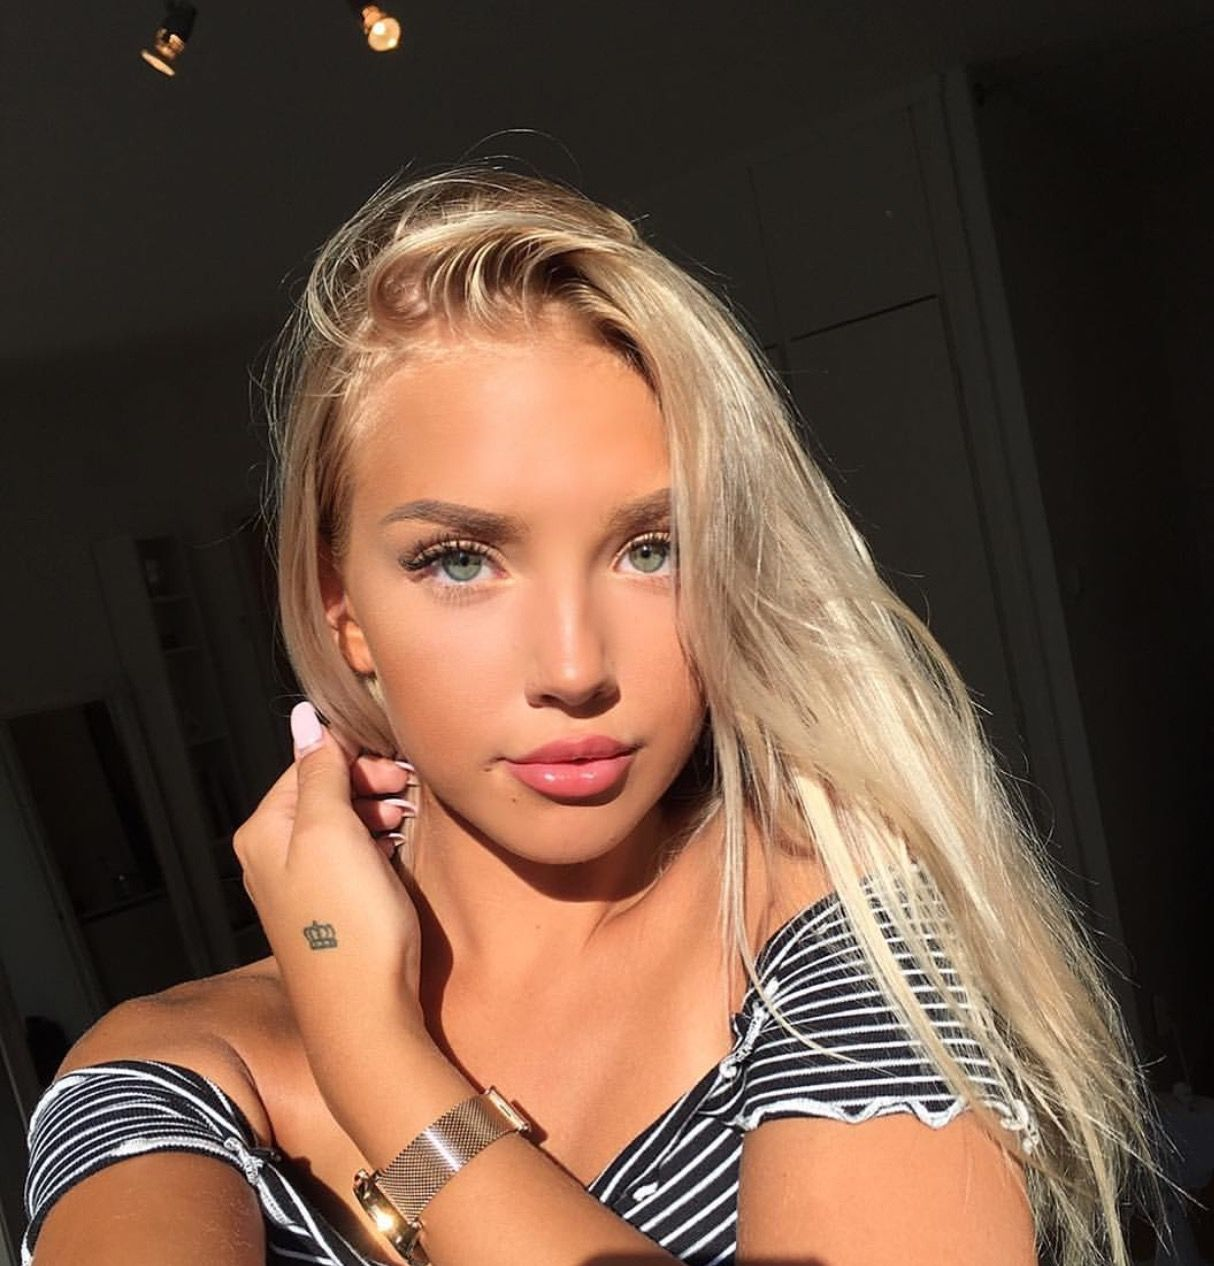 Pin By Cute Babx On Instagram Photos Pretty Blonde Girls Pretty